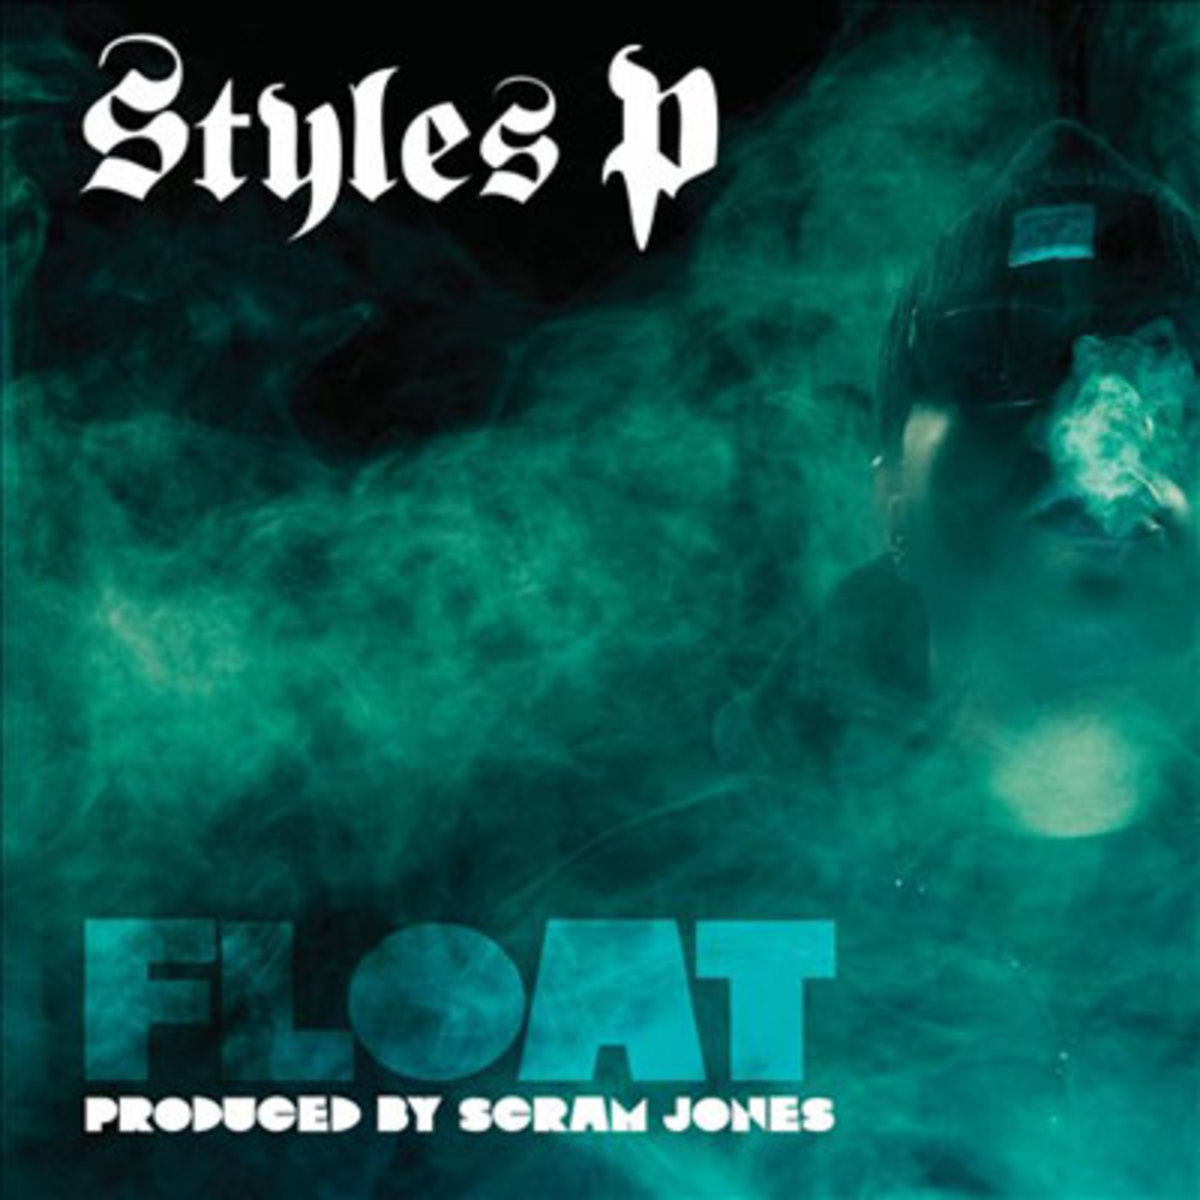 stylesp-float.jpg